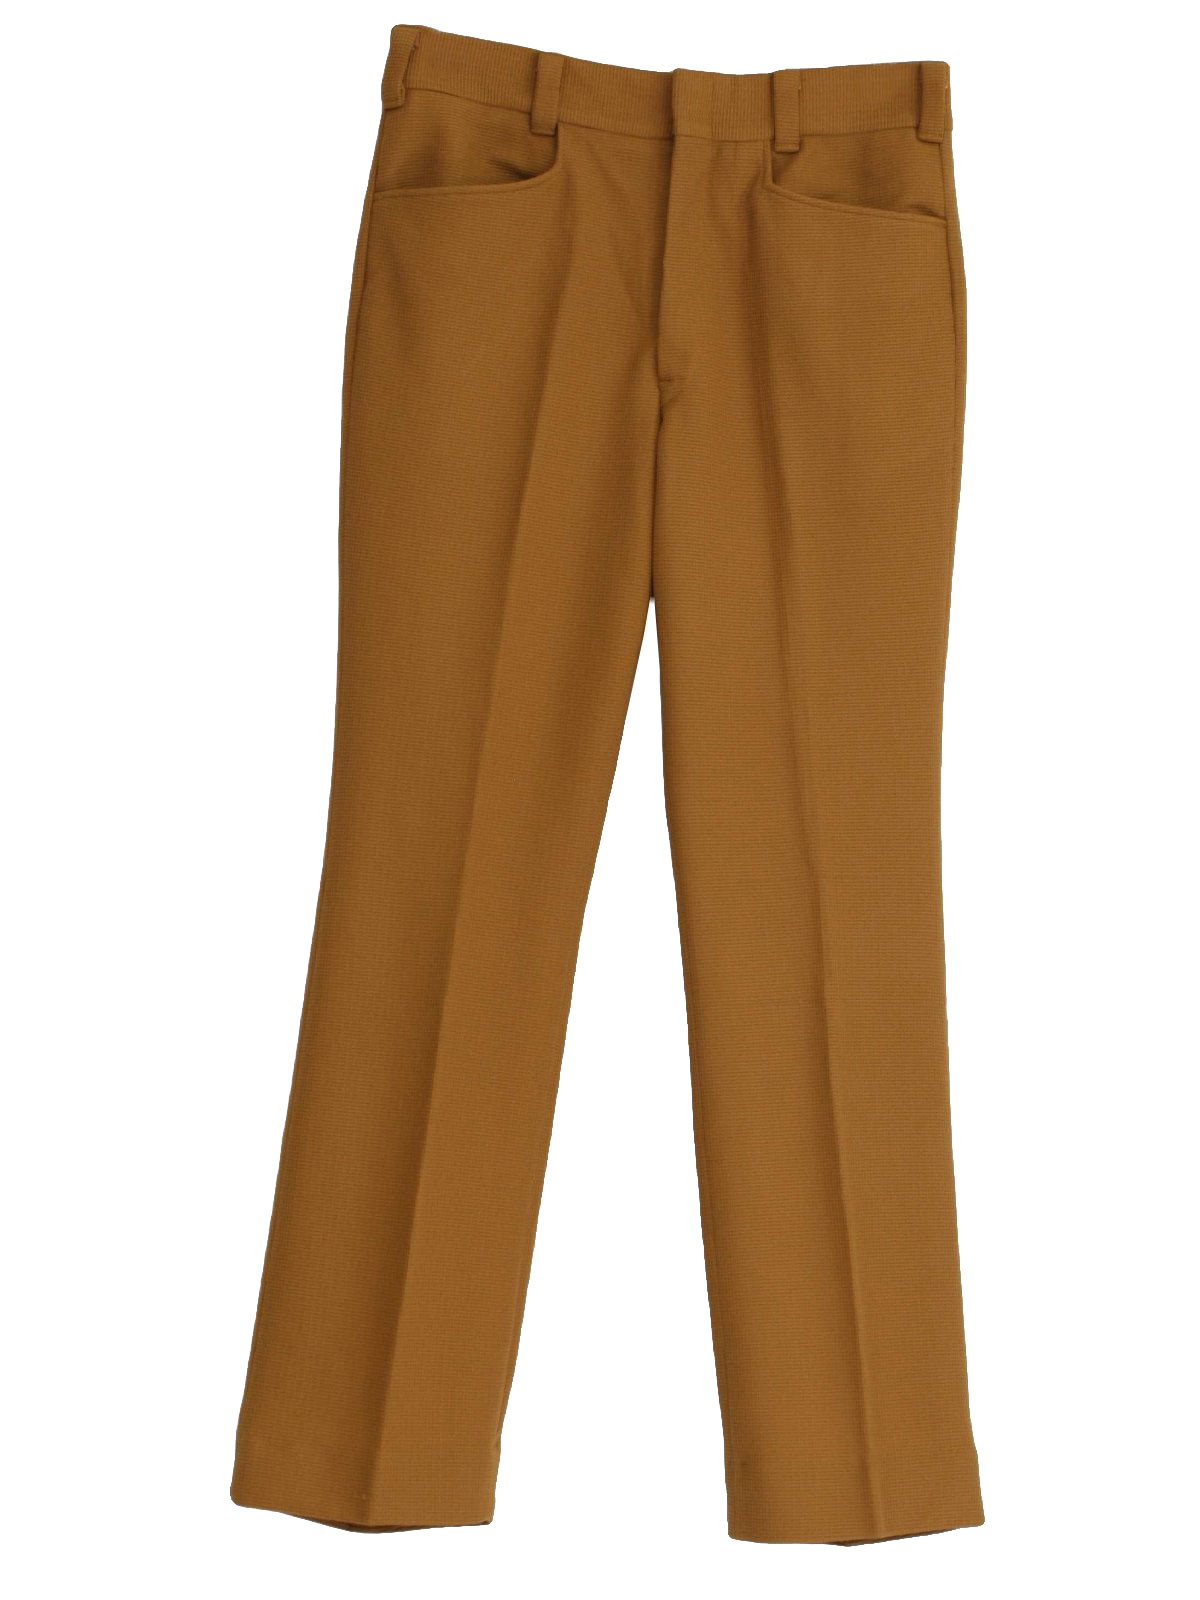 1970 S Vintage A Pants 70s A 1 Mens Dark Camel Colored